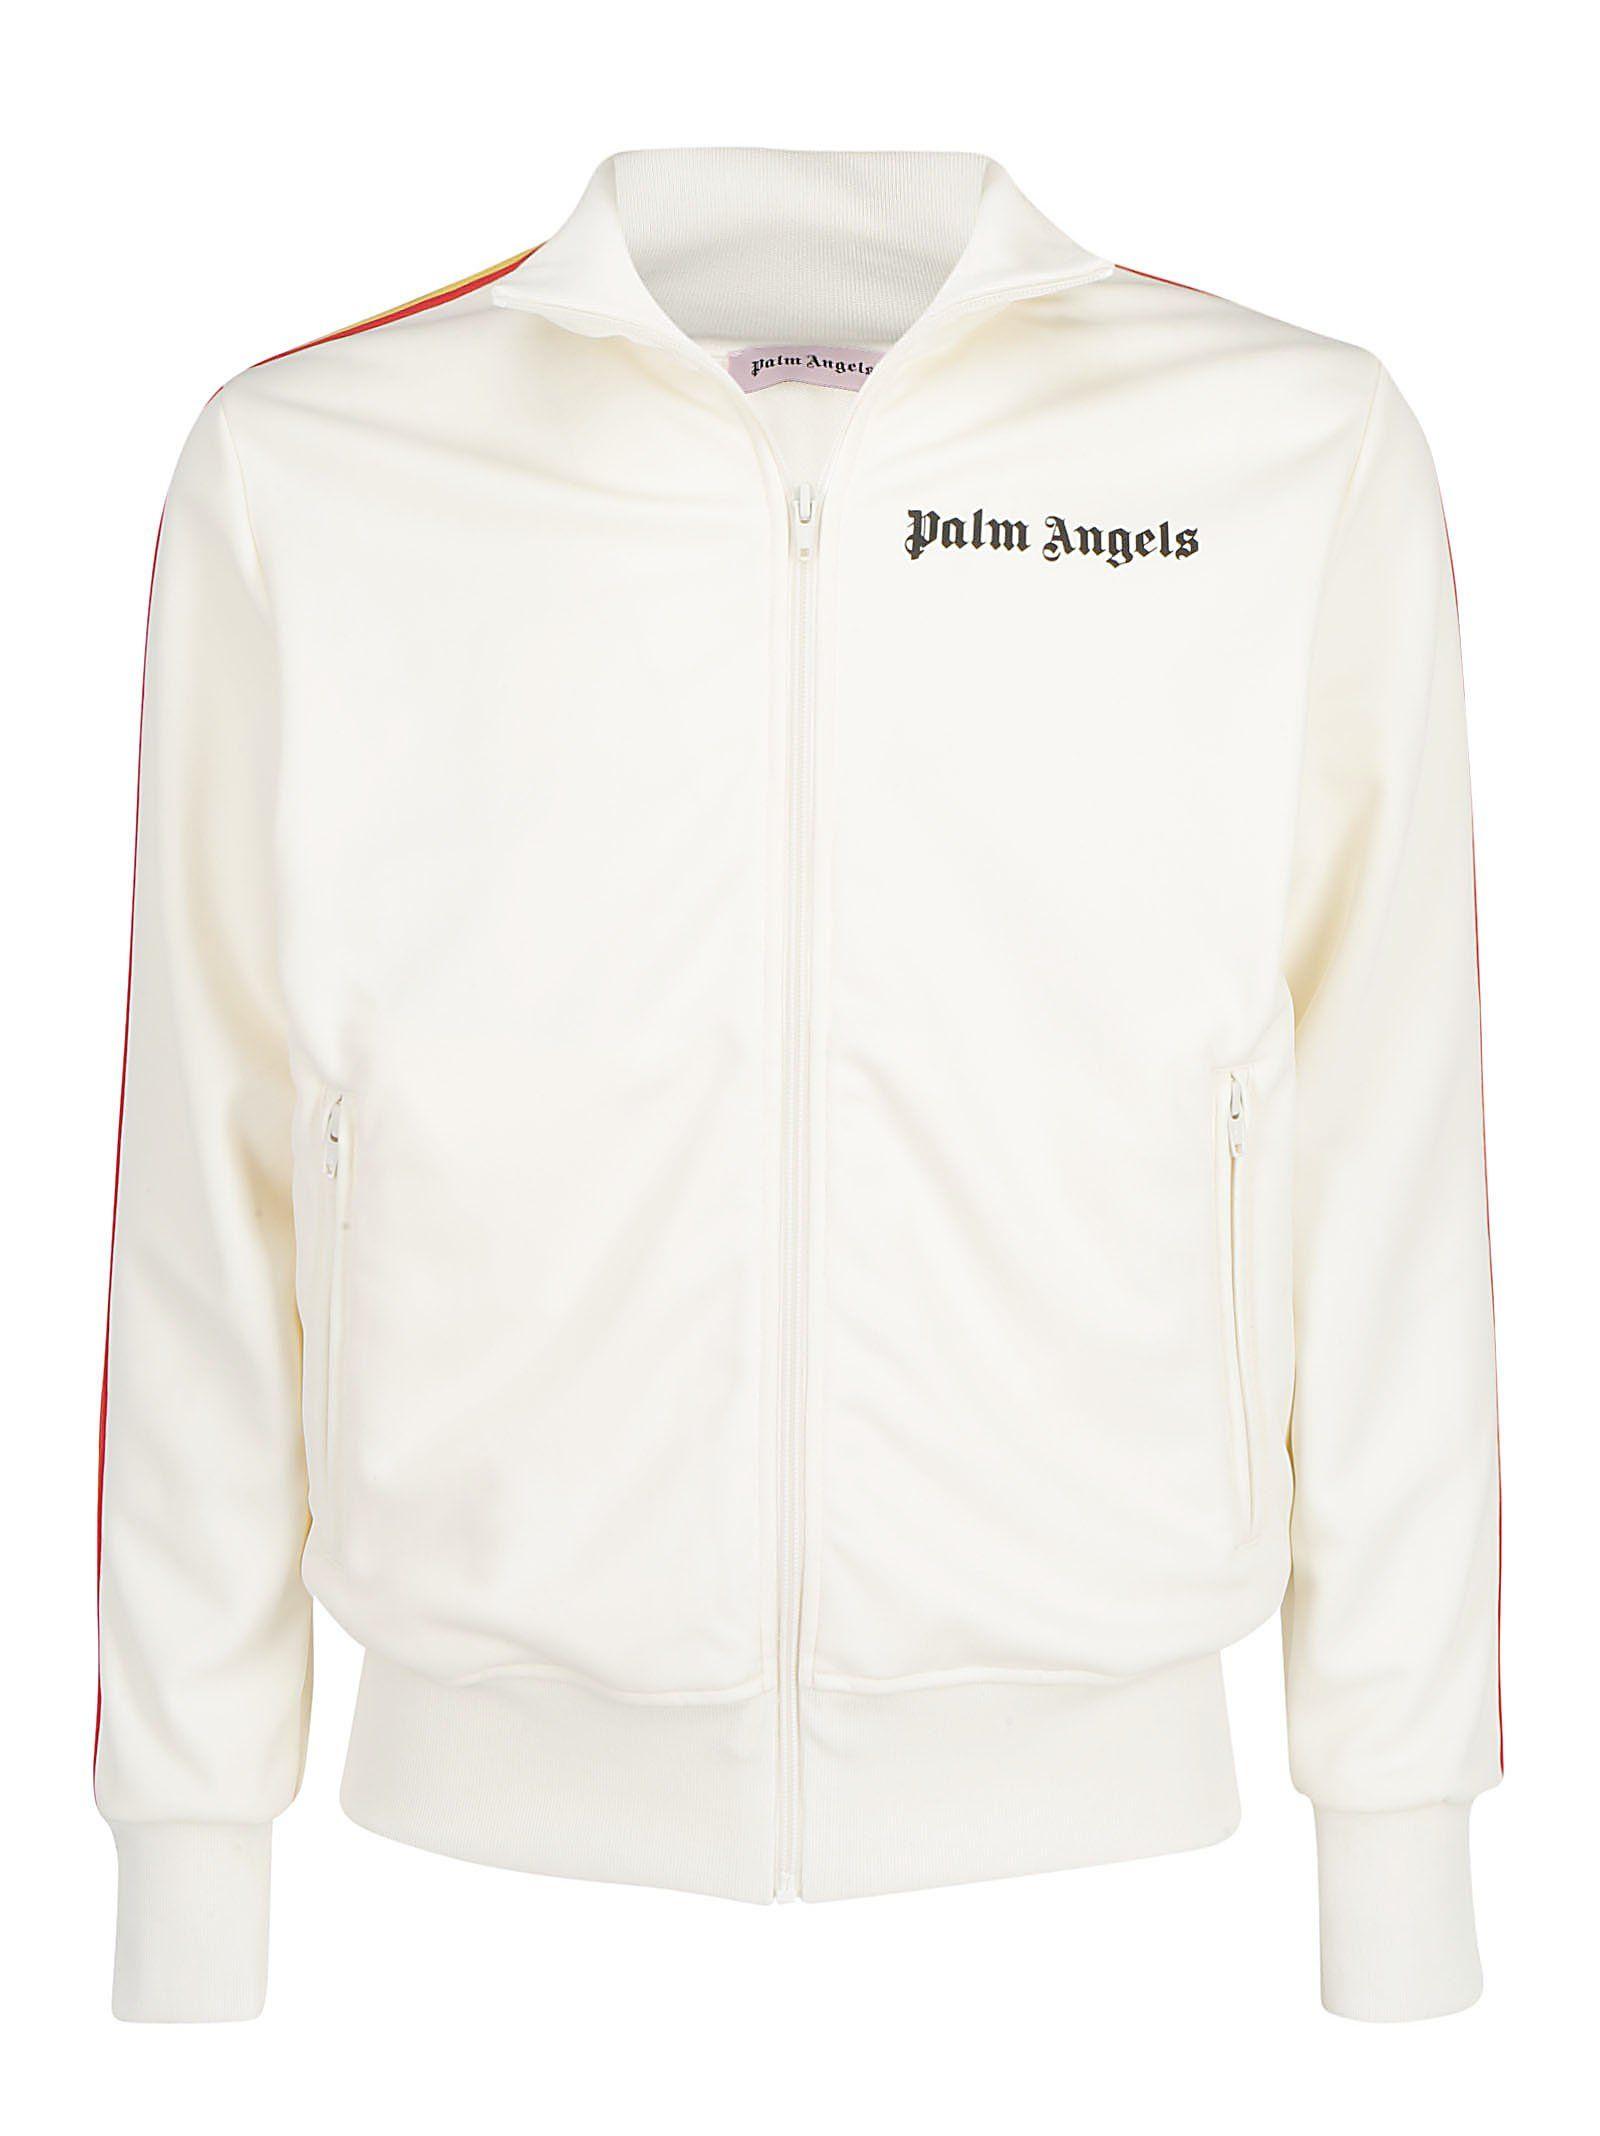 Palm Angels Rainbow Stripe Logo Track Jacket In White Modesens Jackets Track Jackets Rainbow Stripes [ 2136 x 1600 Pixel ]